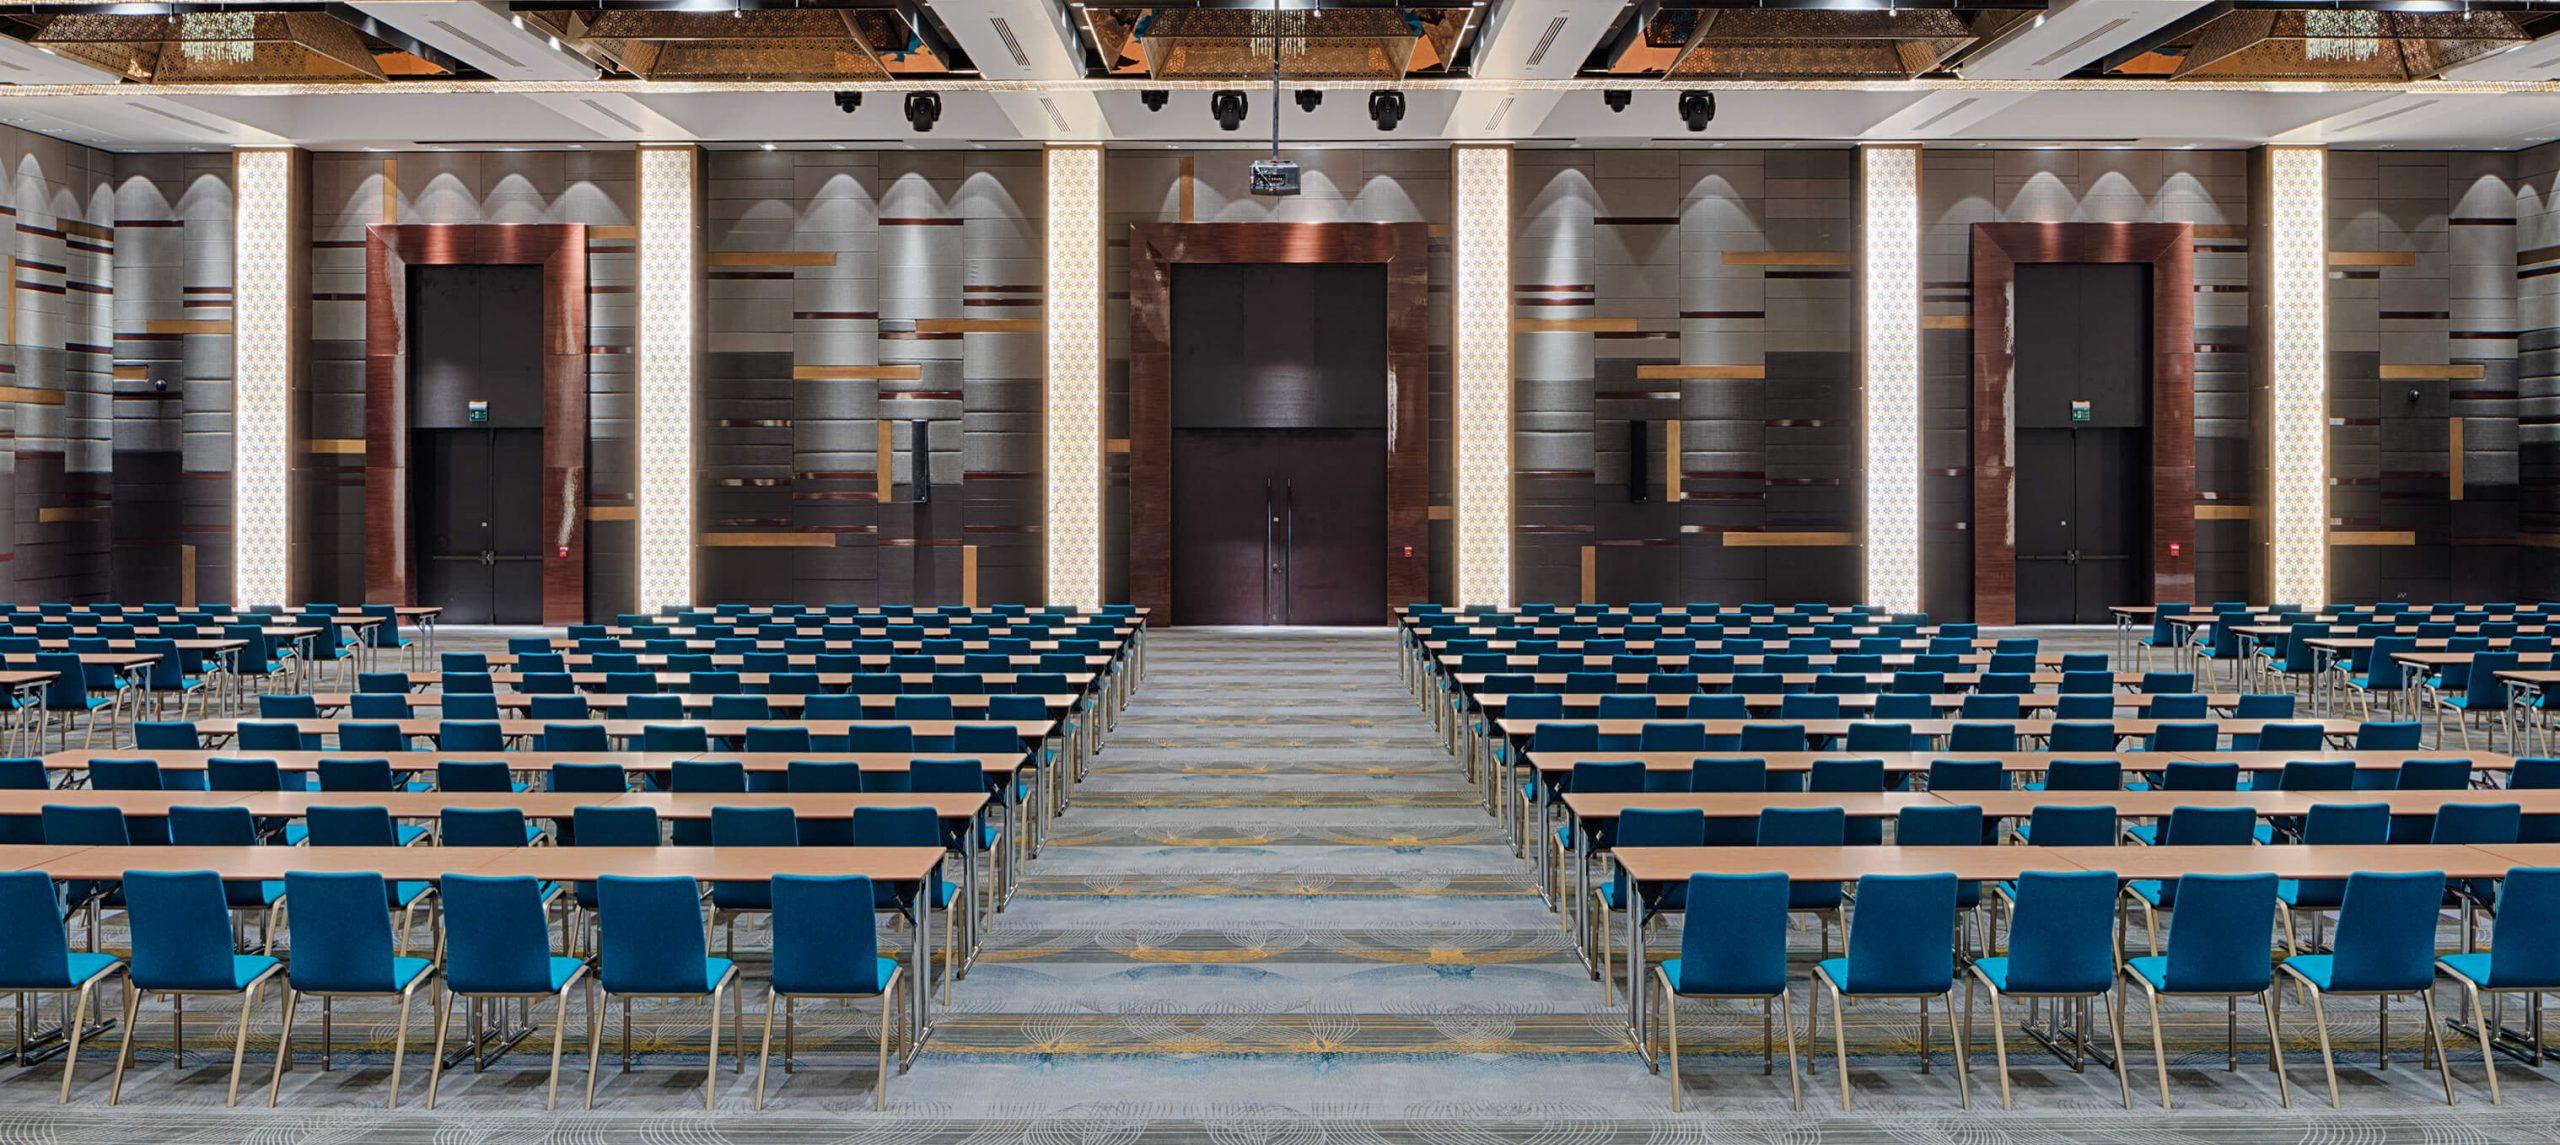 Mendola 16 Westin Doha Ballroom Classroom_3036x1358